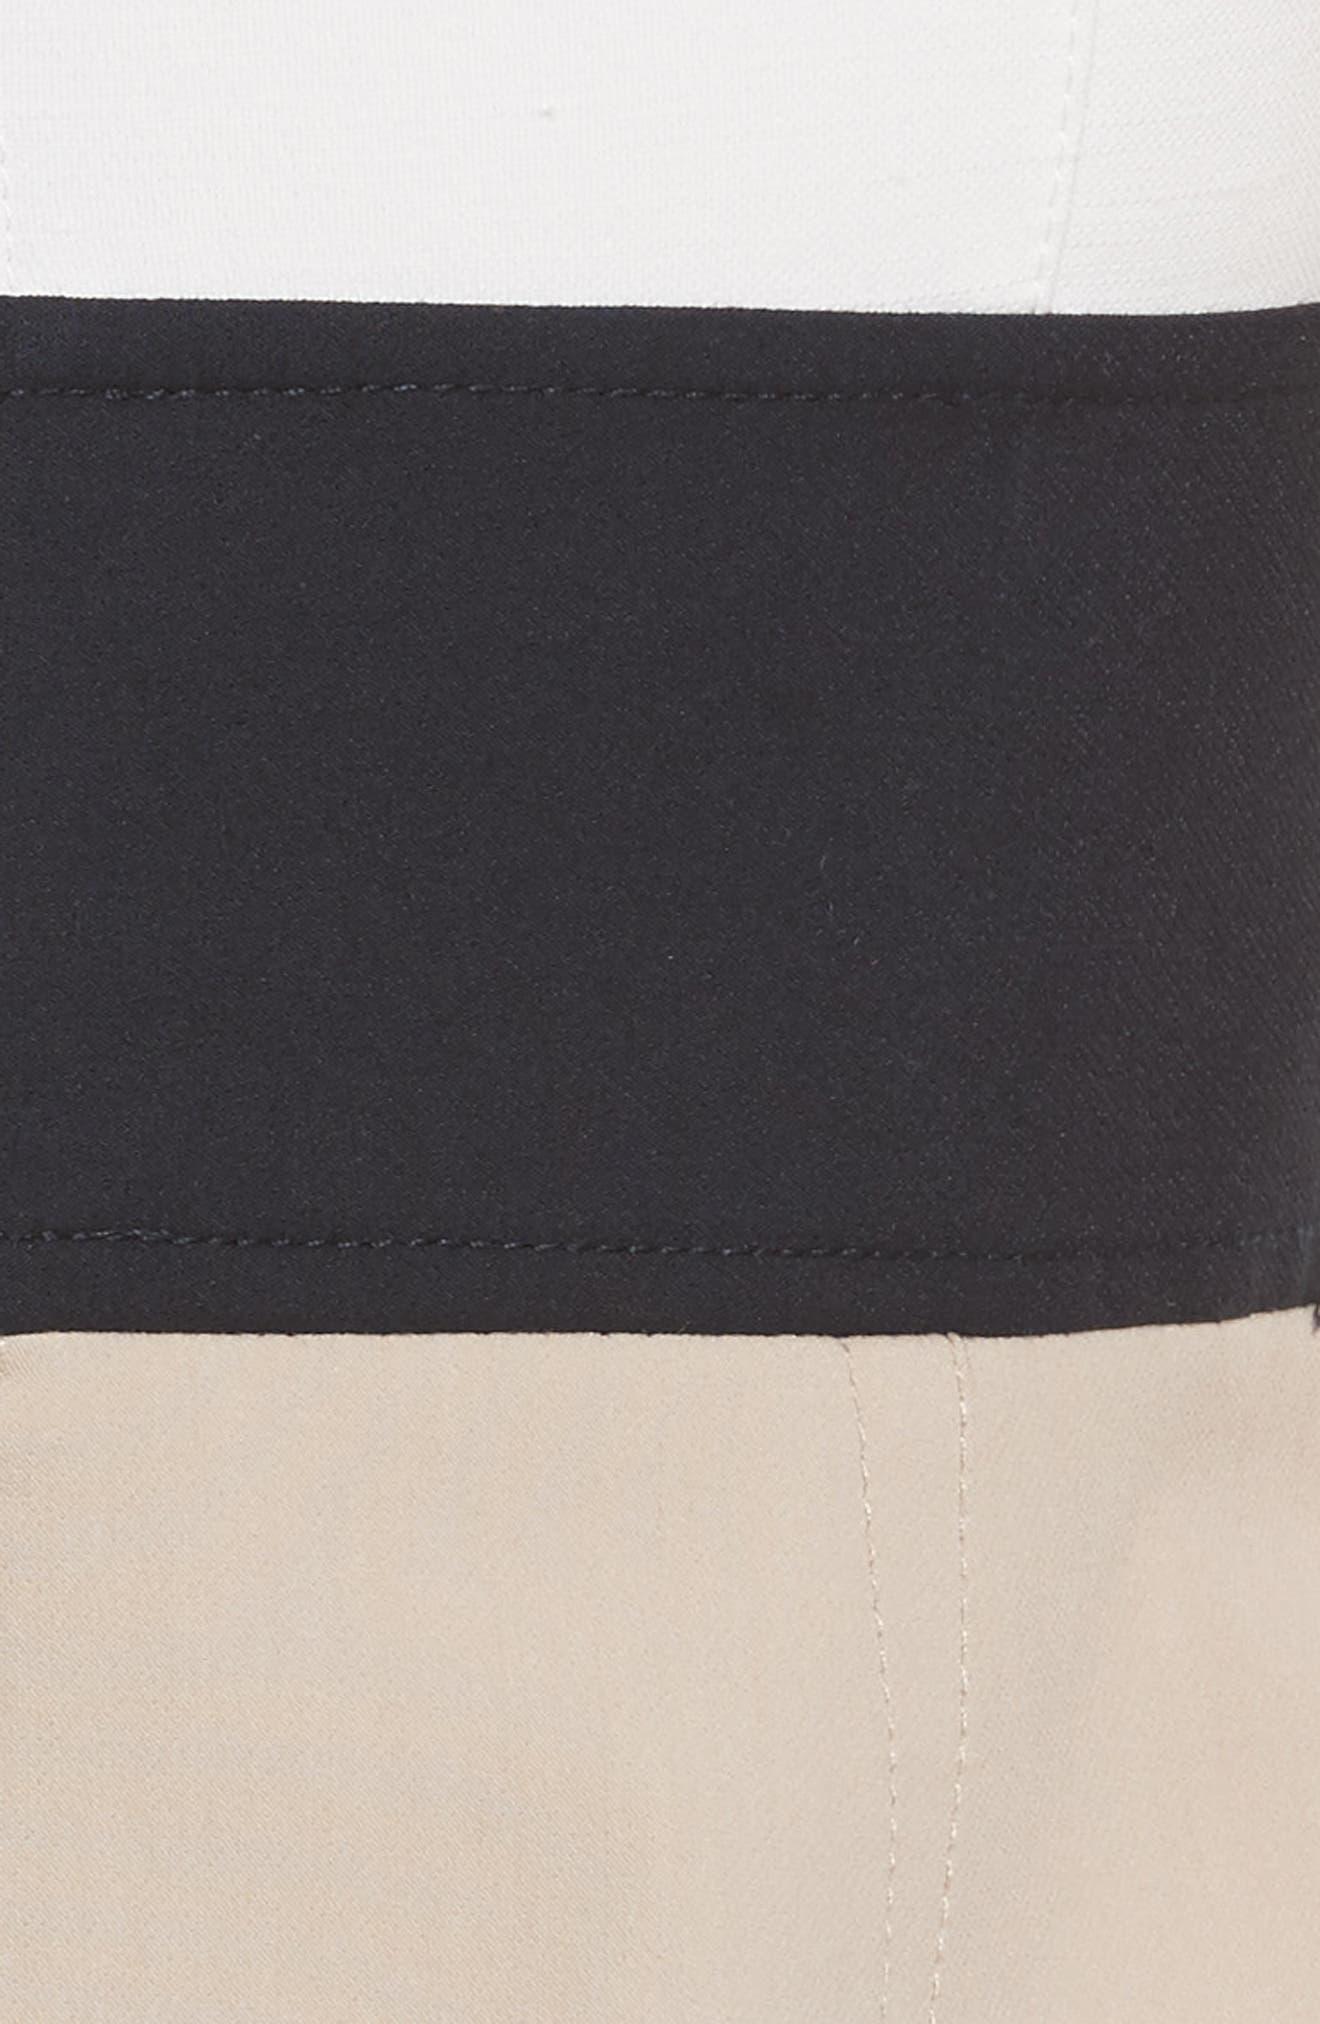 Diane von Furstenberg Colorblock Stretch Cotton Blend Sheath Dress,                             Alternate thumbnail 5, color,                             Sand/ Alexander Navy/ White